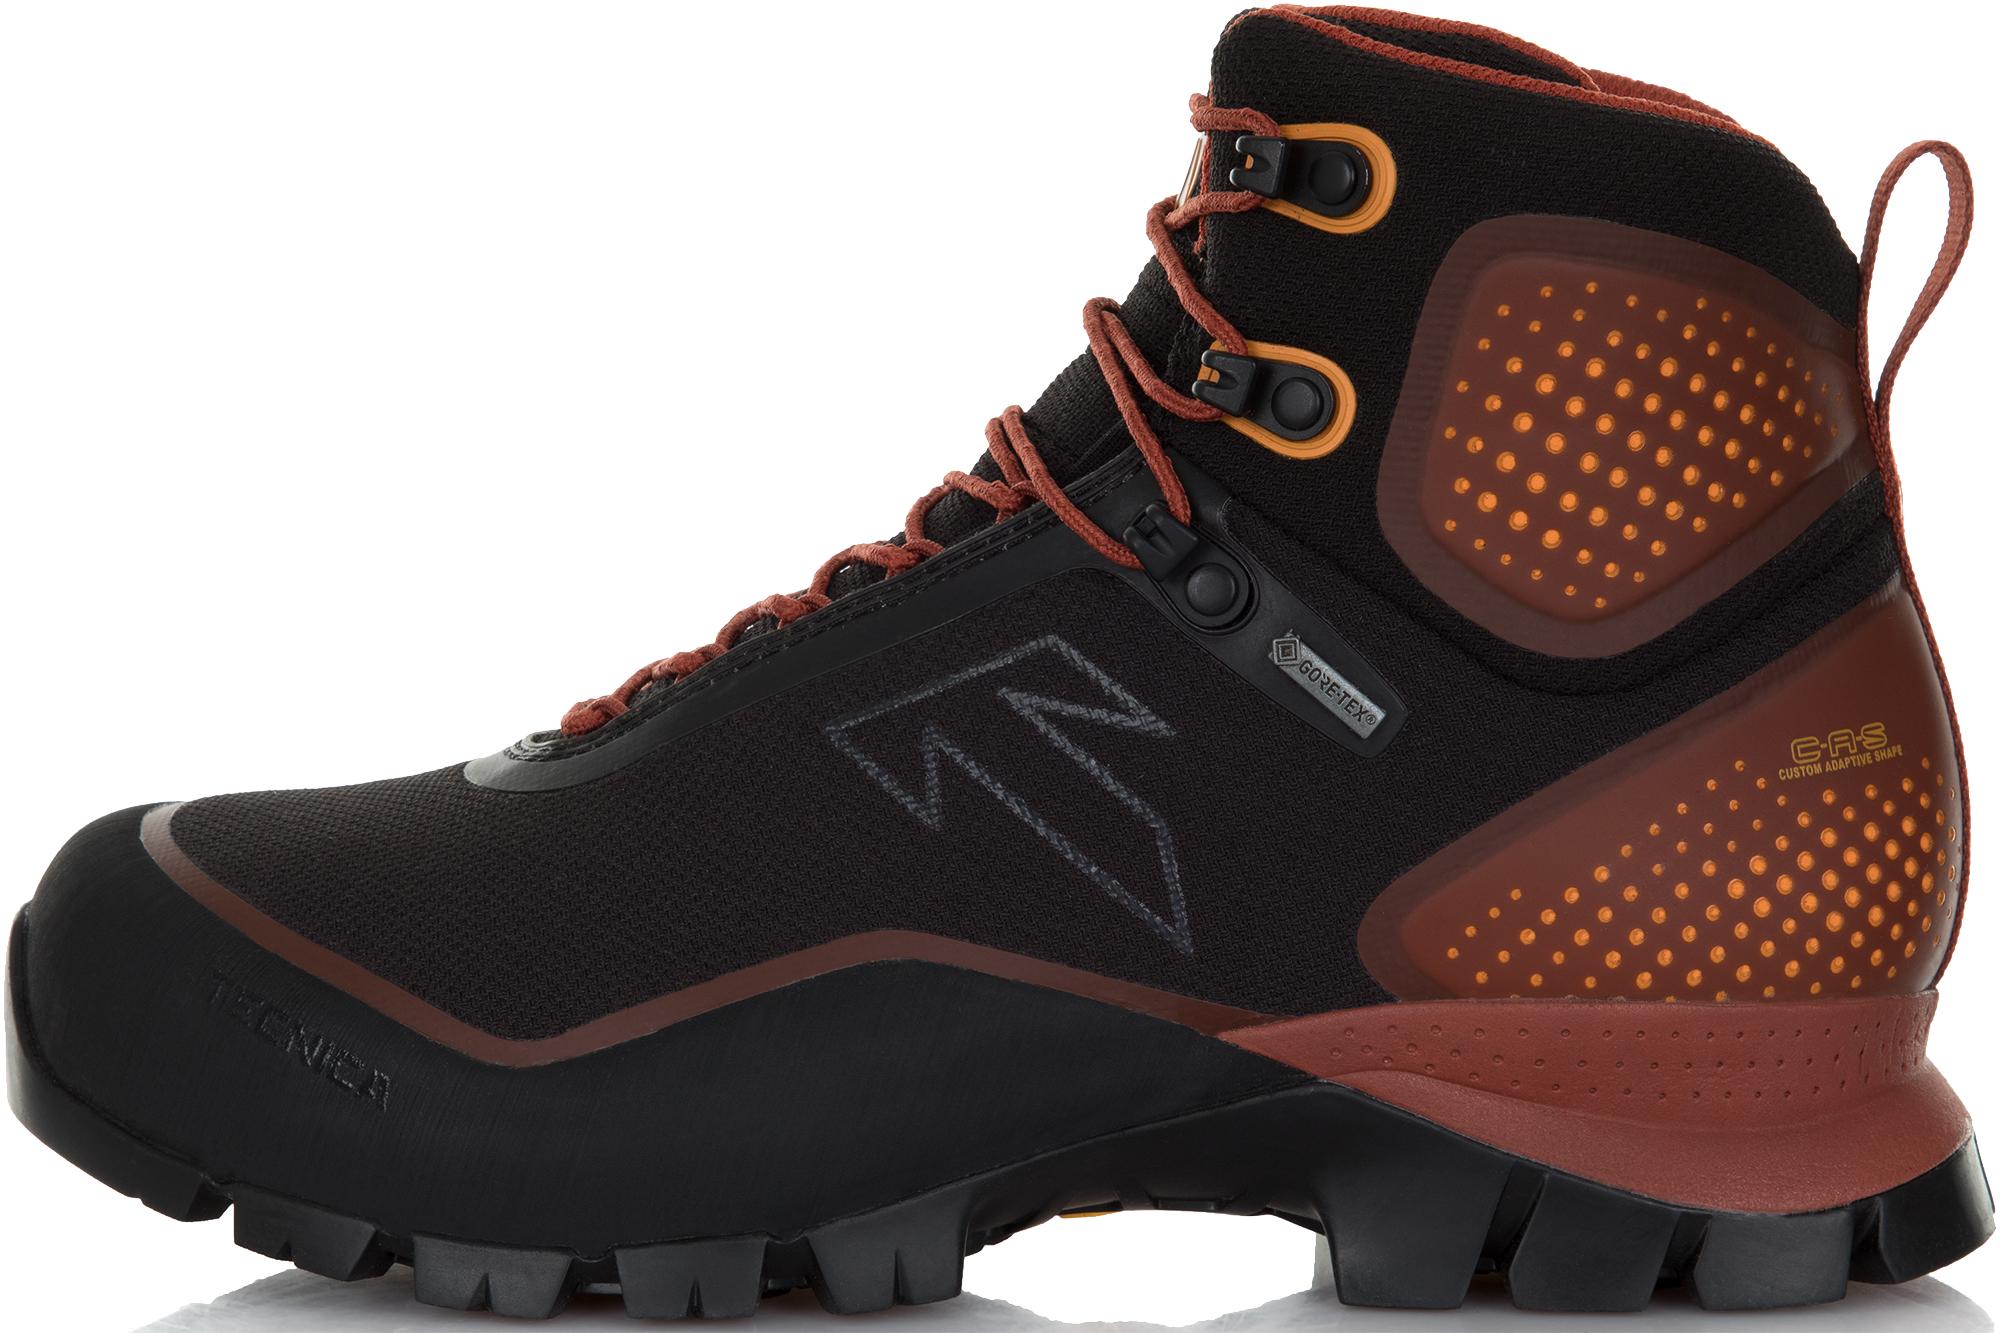 Tecnica Ботинки мужские Forge, размер 44